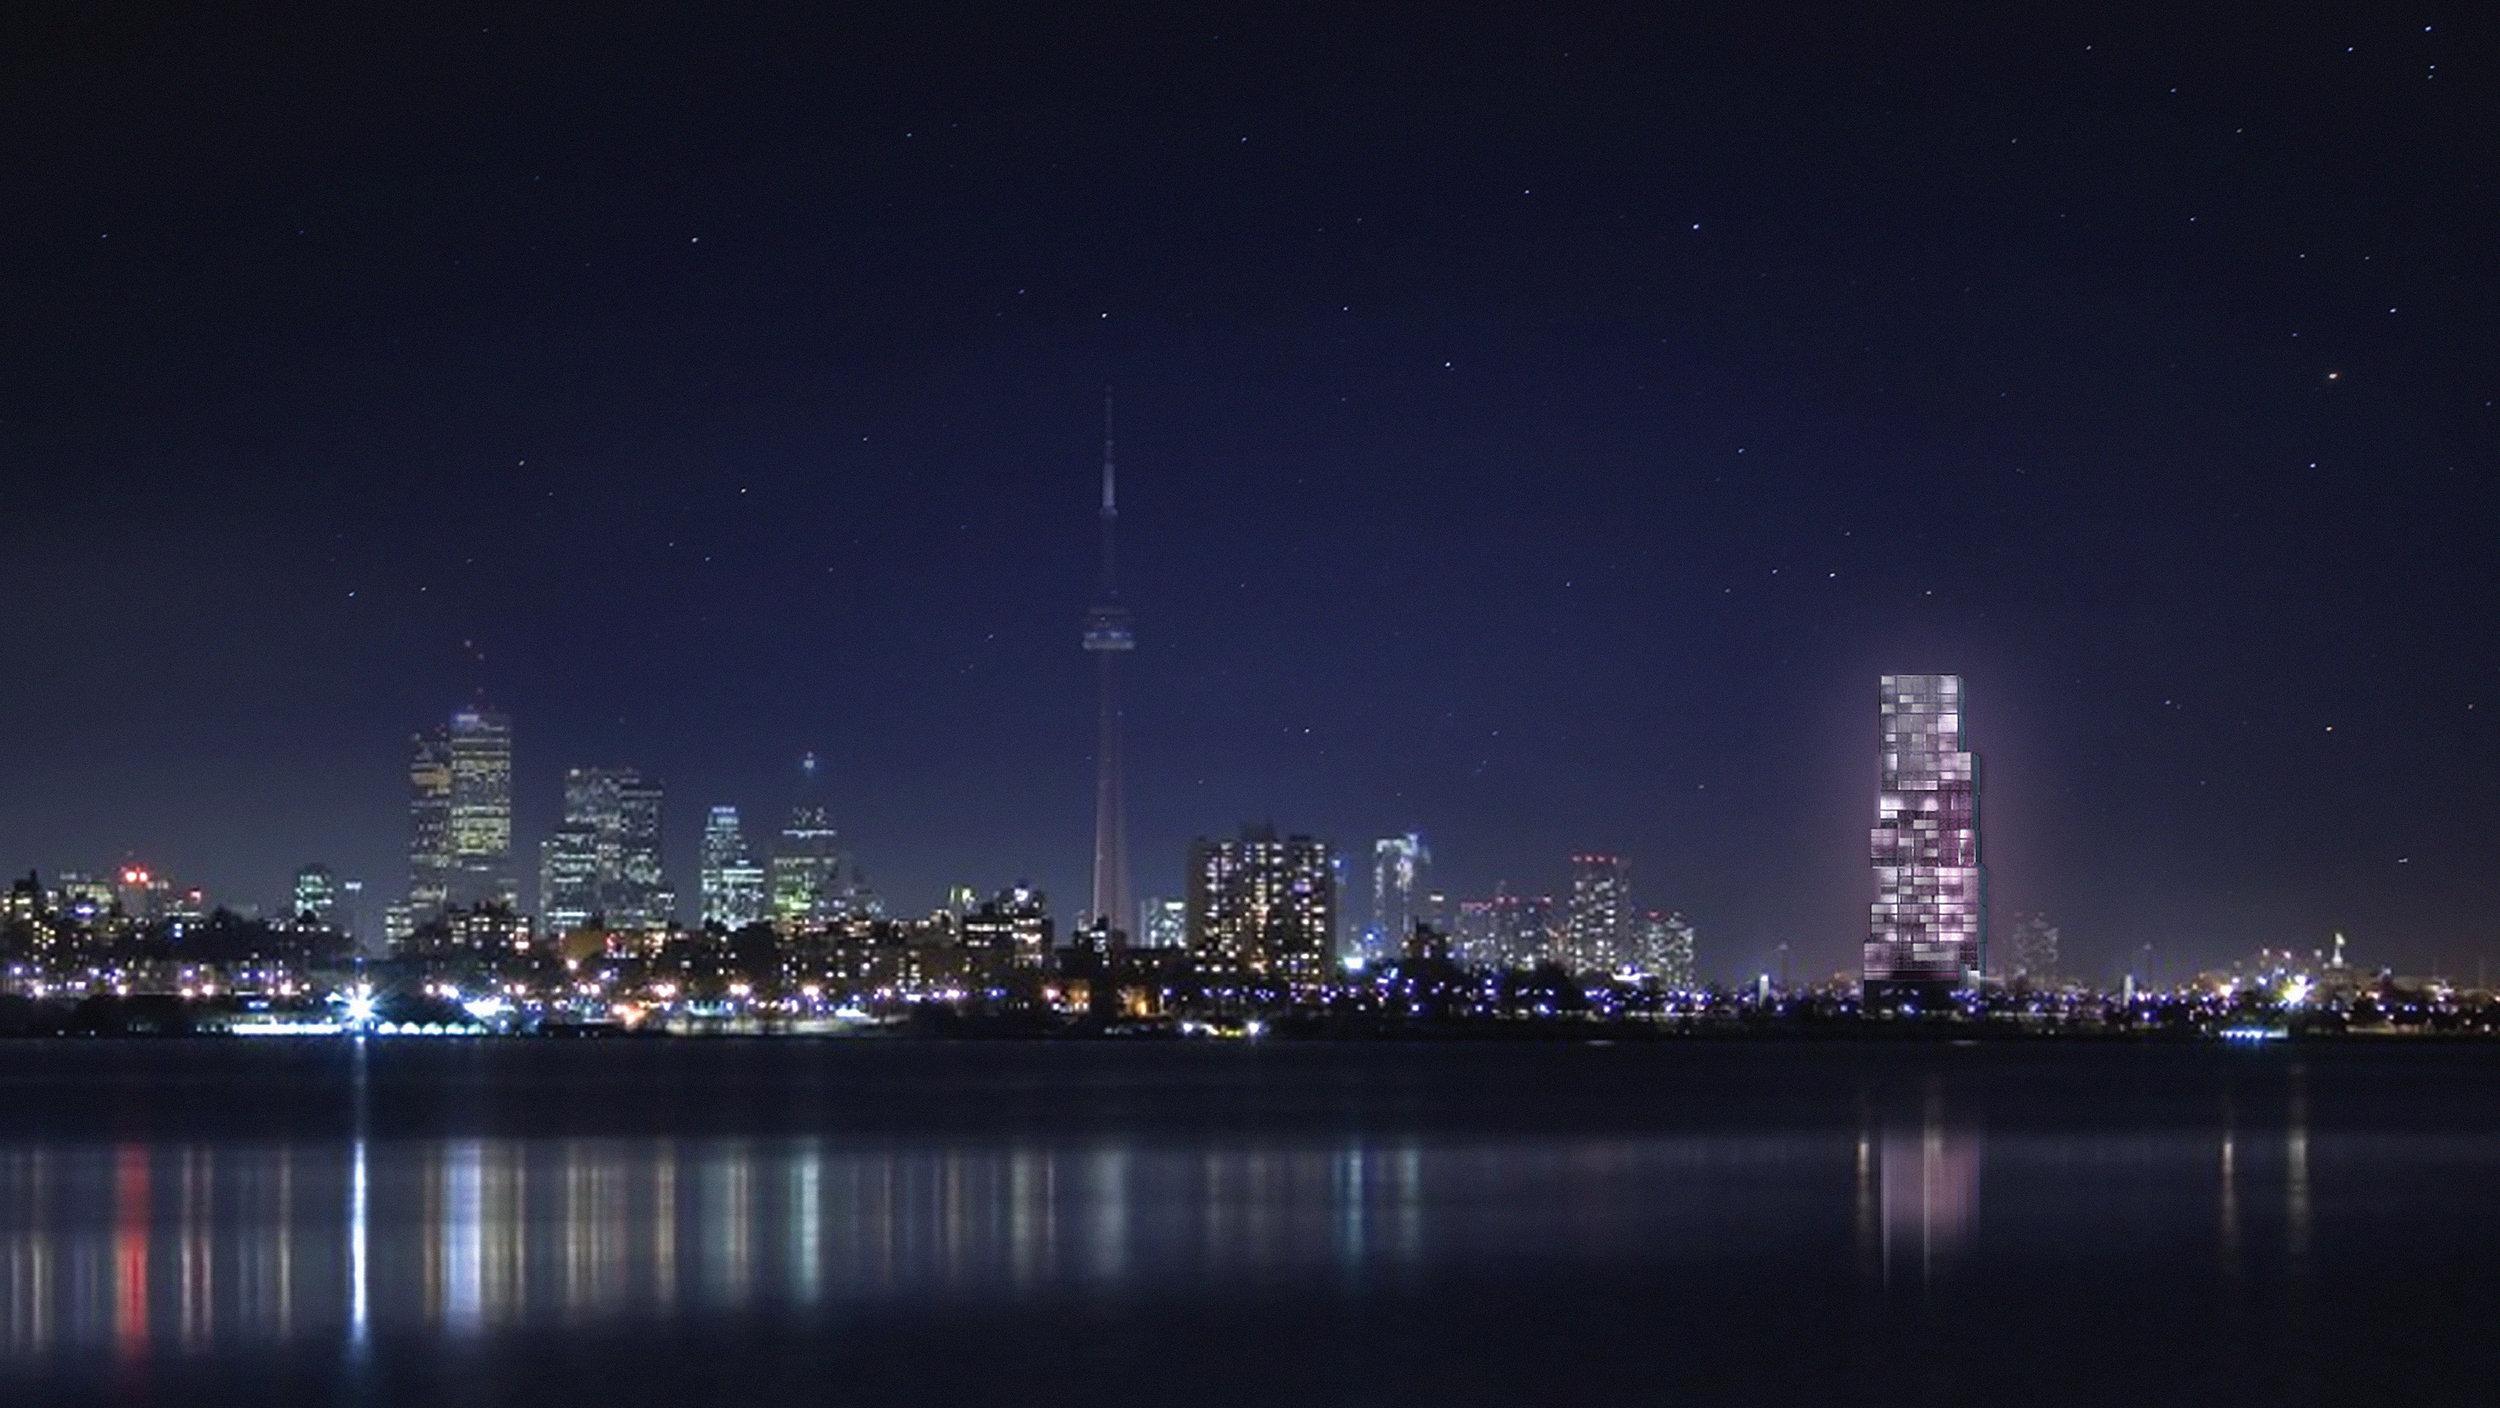 CNE Hotel - Night skyline lake colour